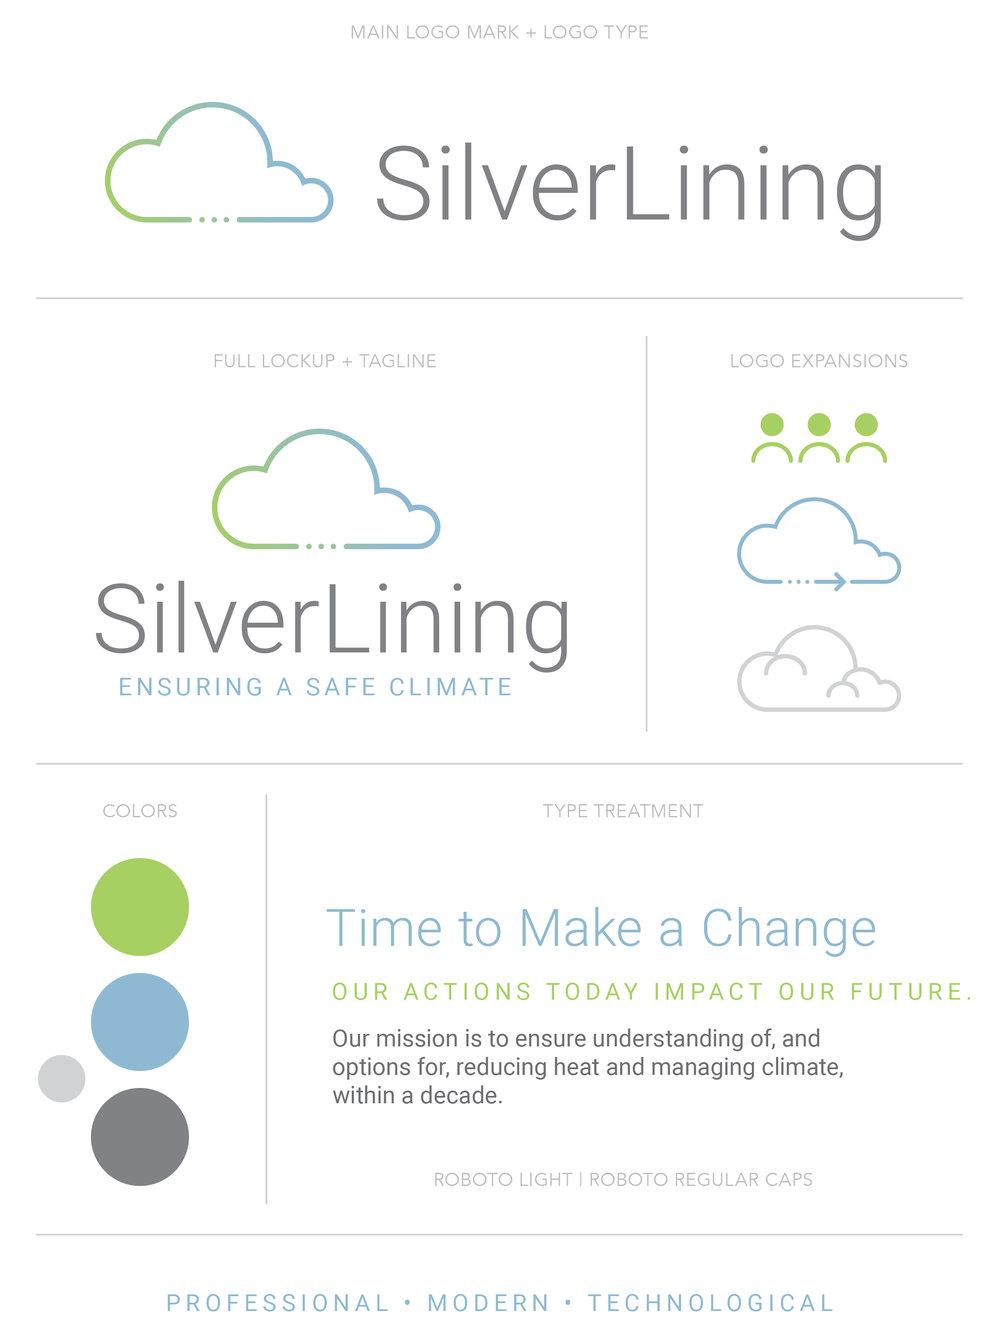 SilverLining_Identity-Overview.jpg